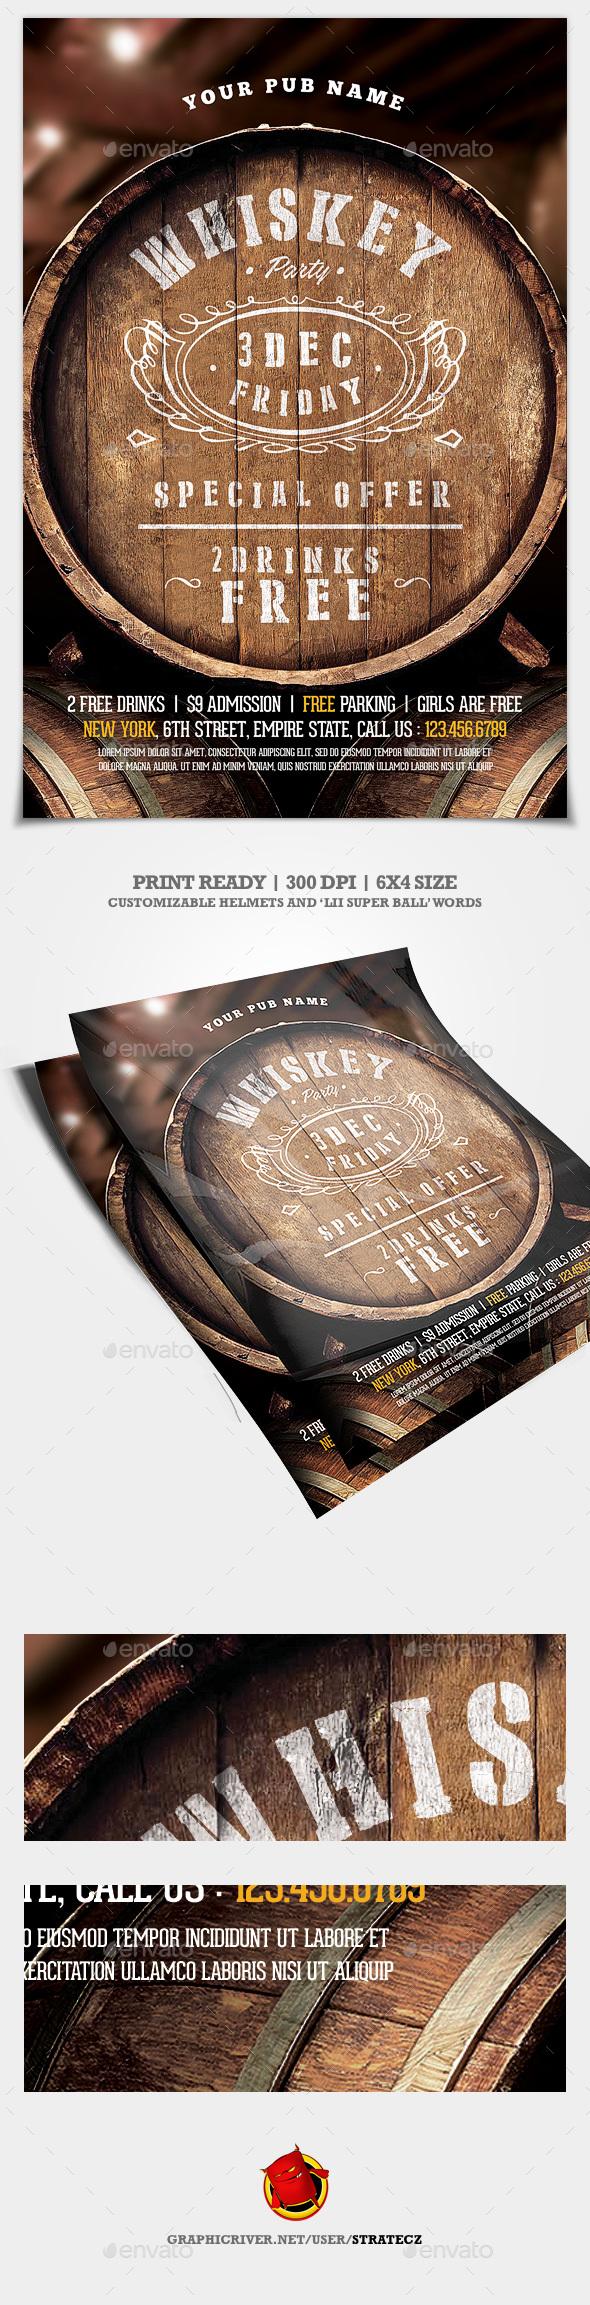 Whiskey Flyer - Print Templates